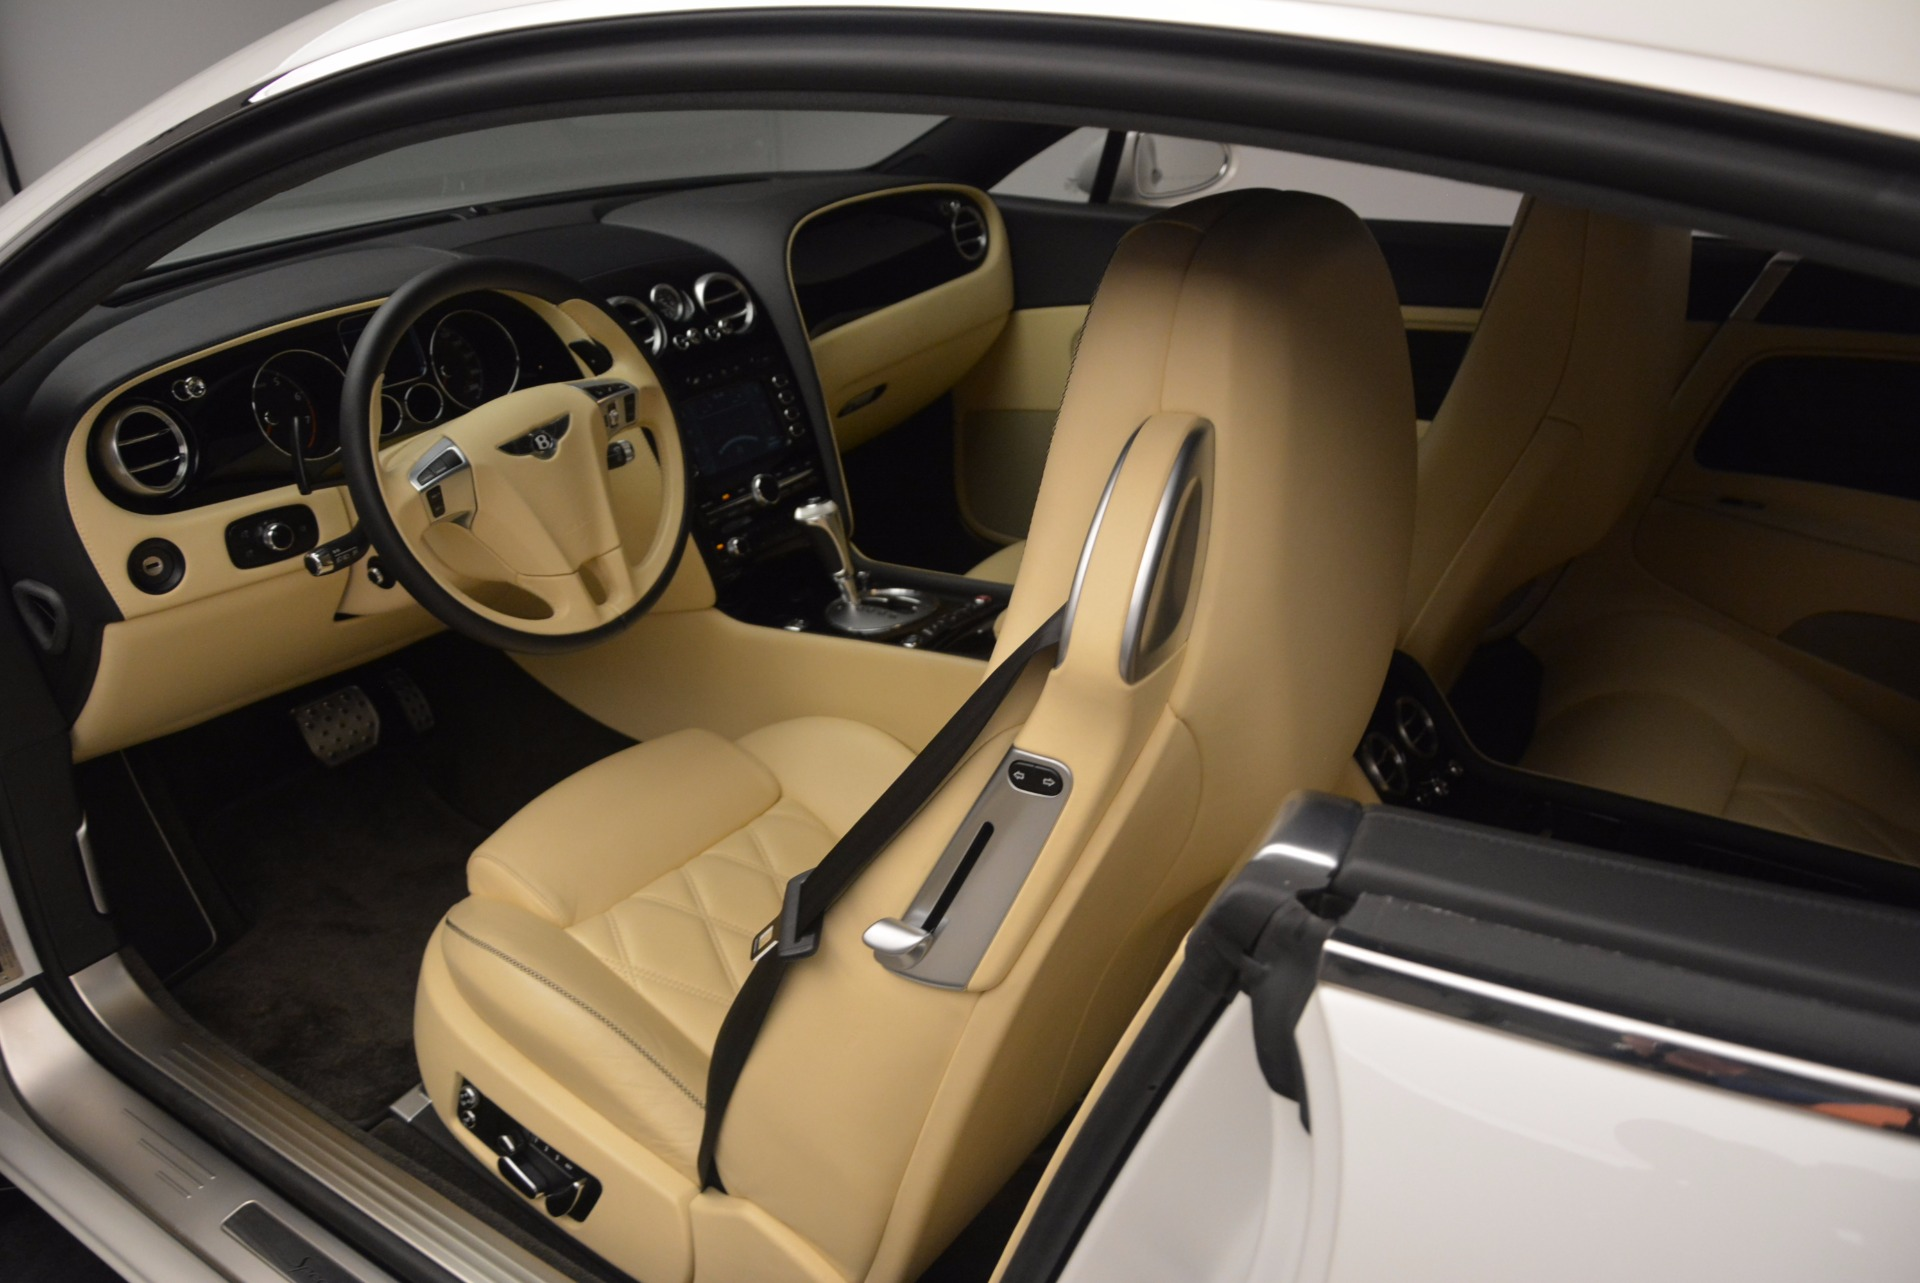 Used 2008 Bentley Continental GT Speed For Sale In Westport, CT 1552_p36